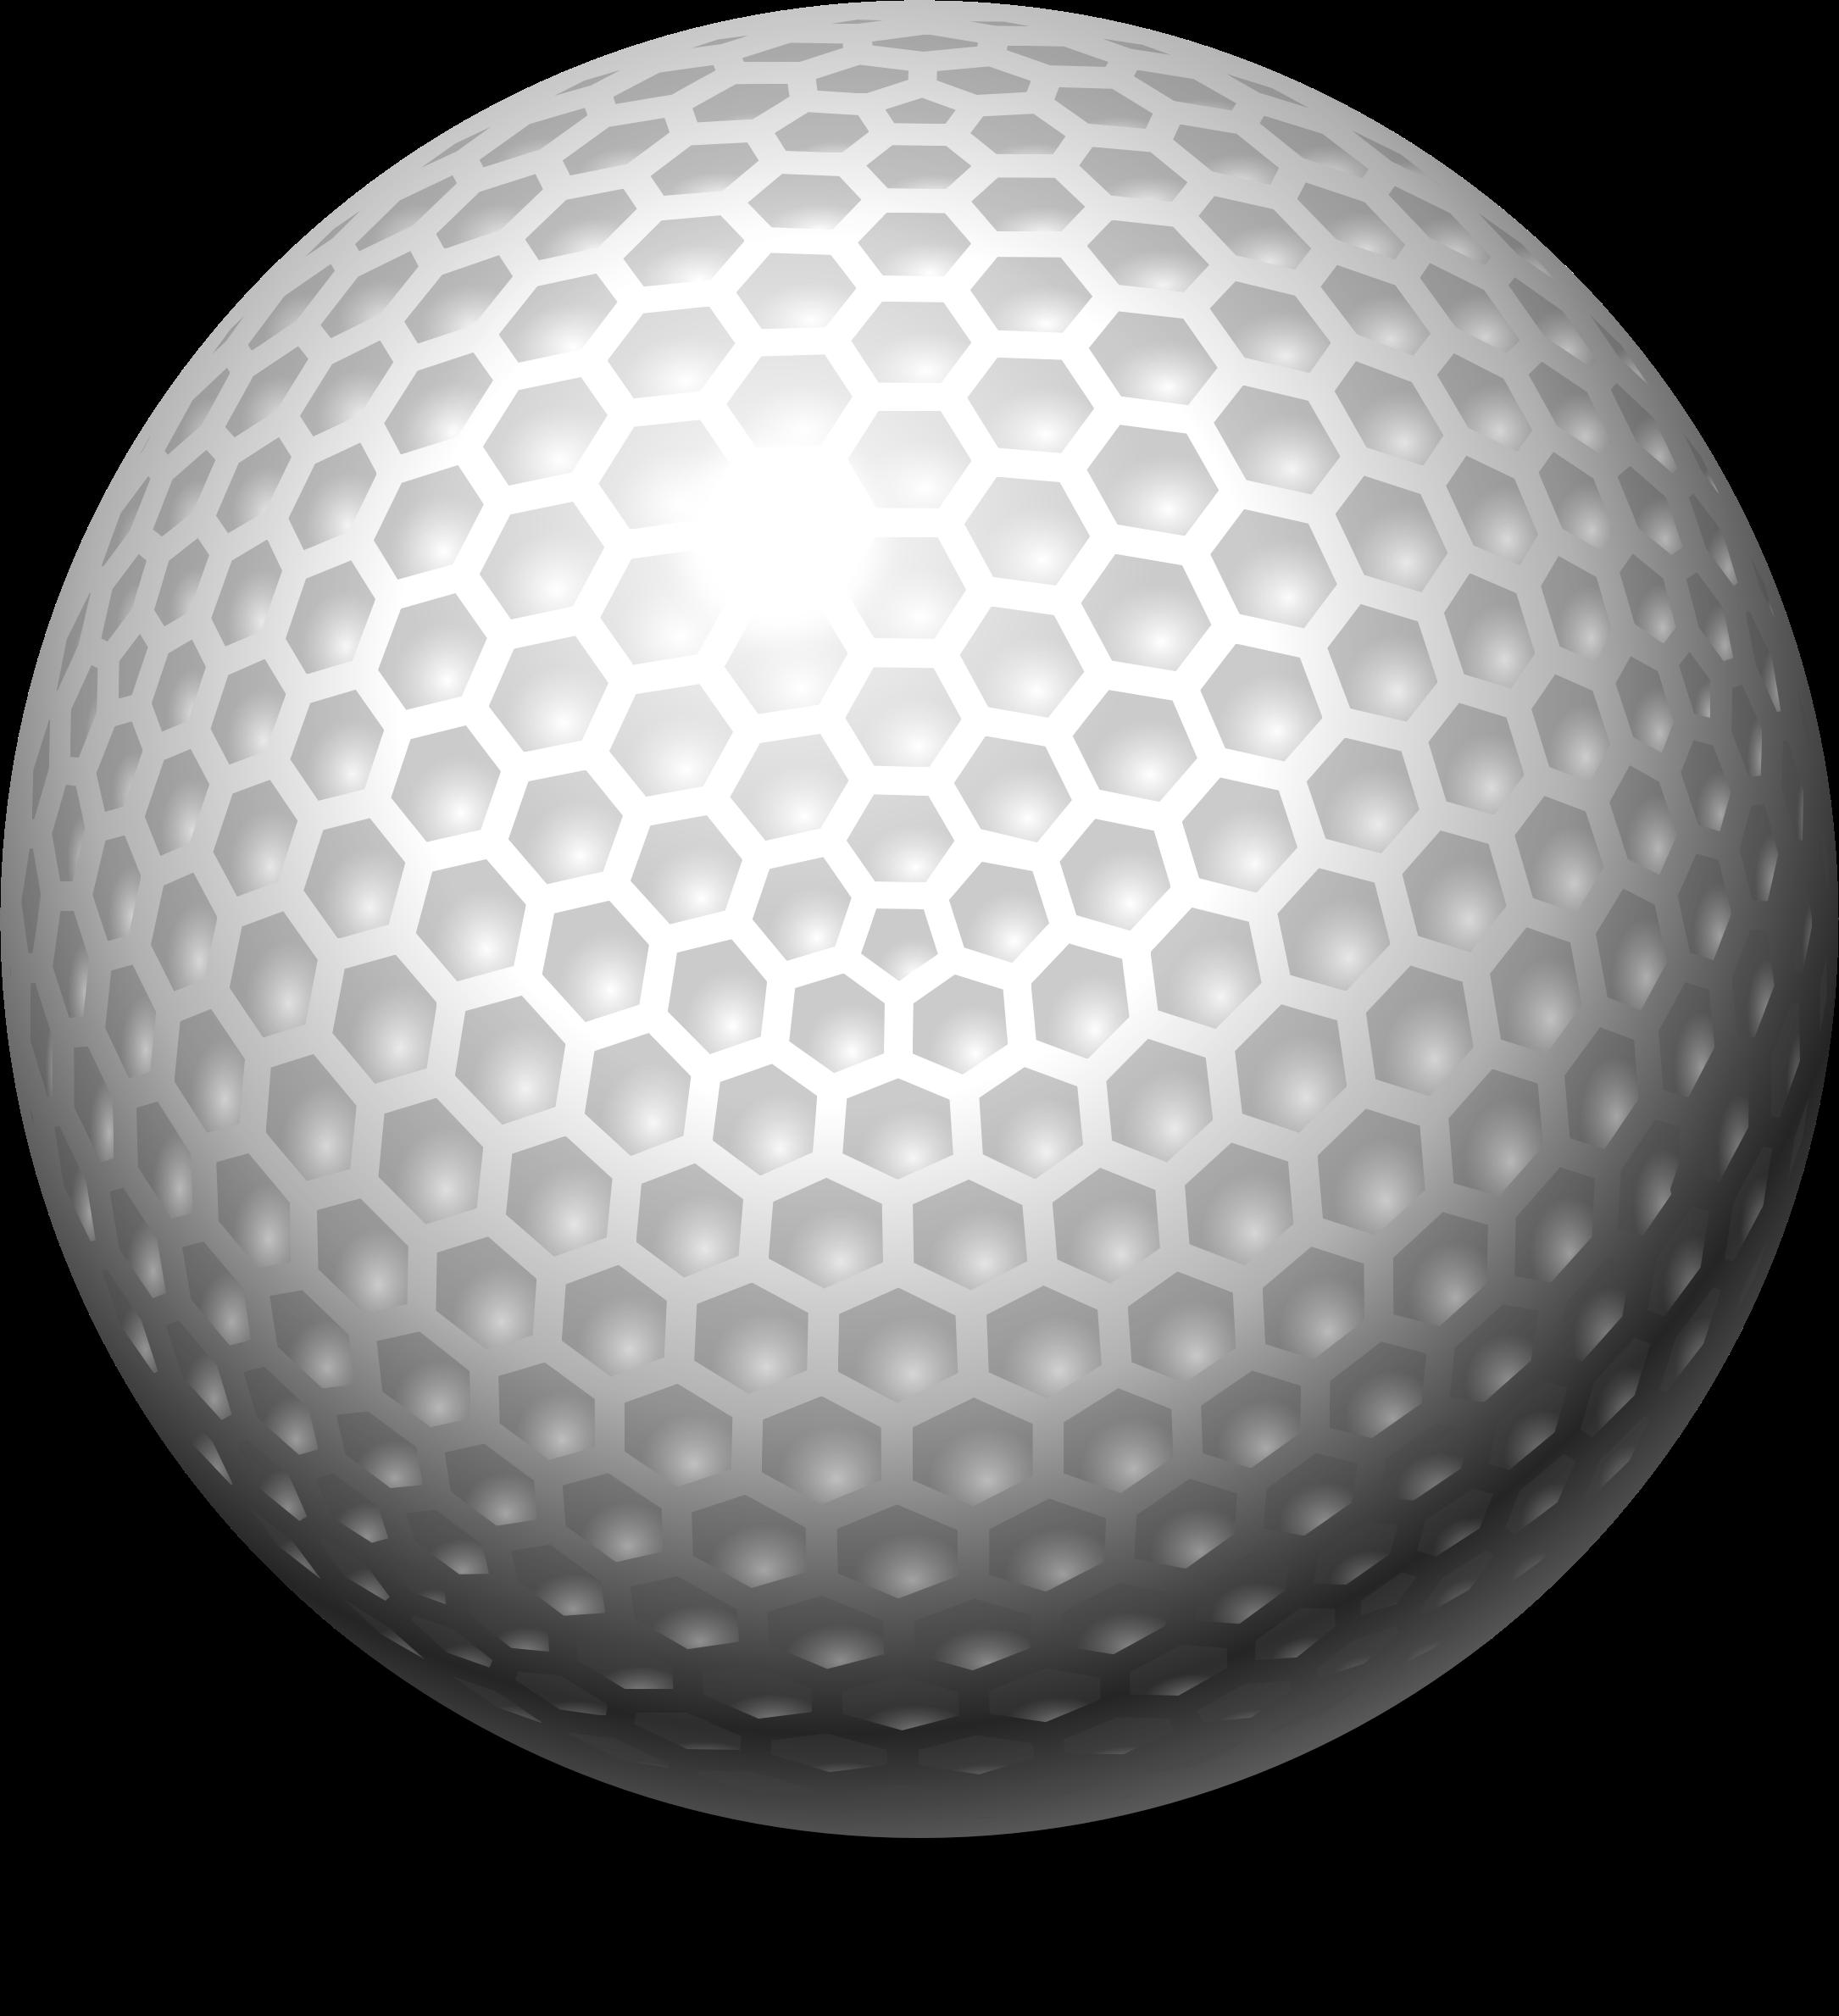 Clipart golf ball golfo kamuoliukas